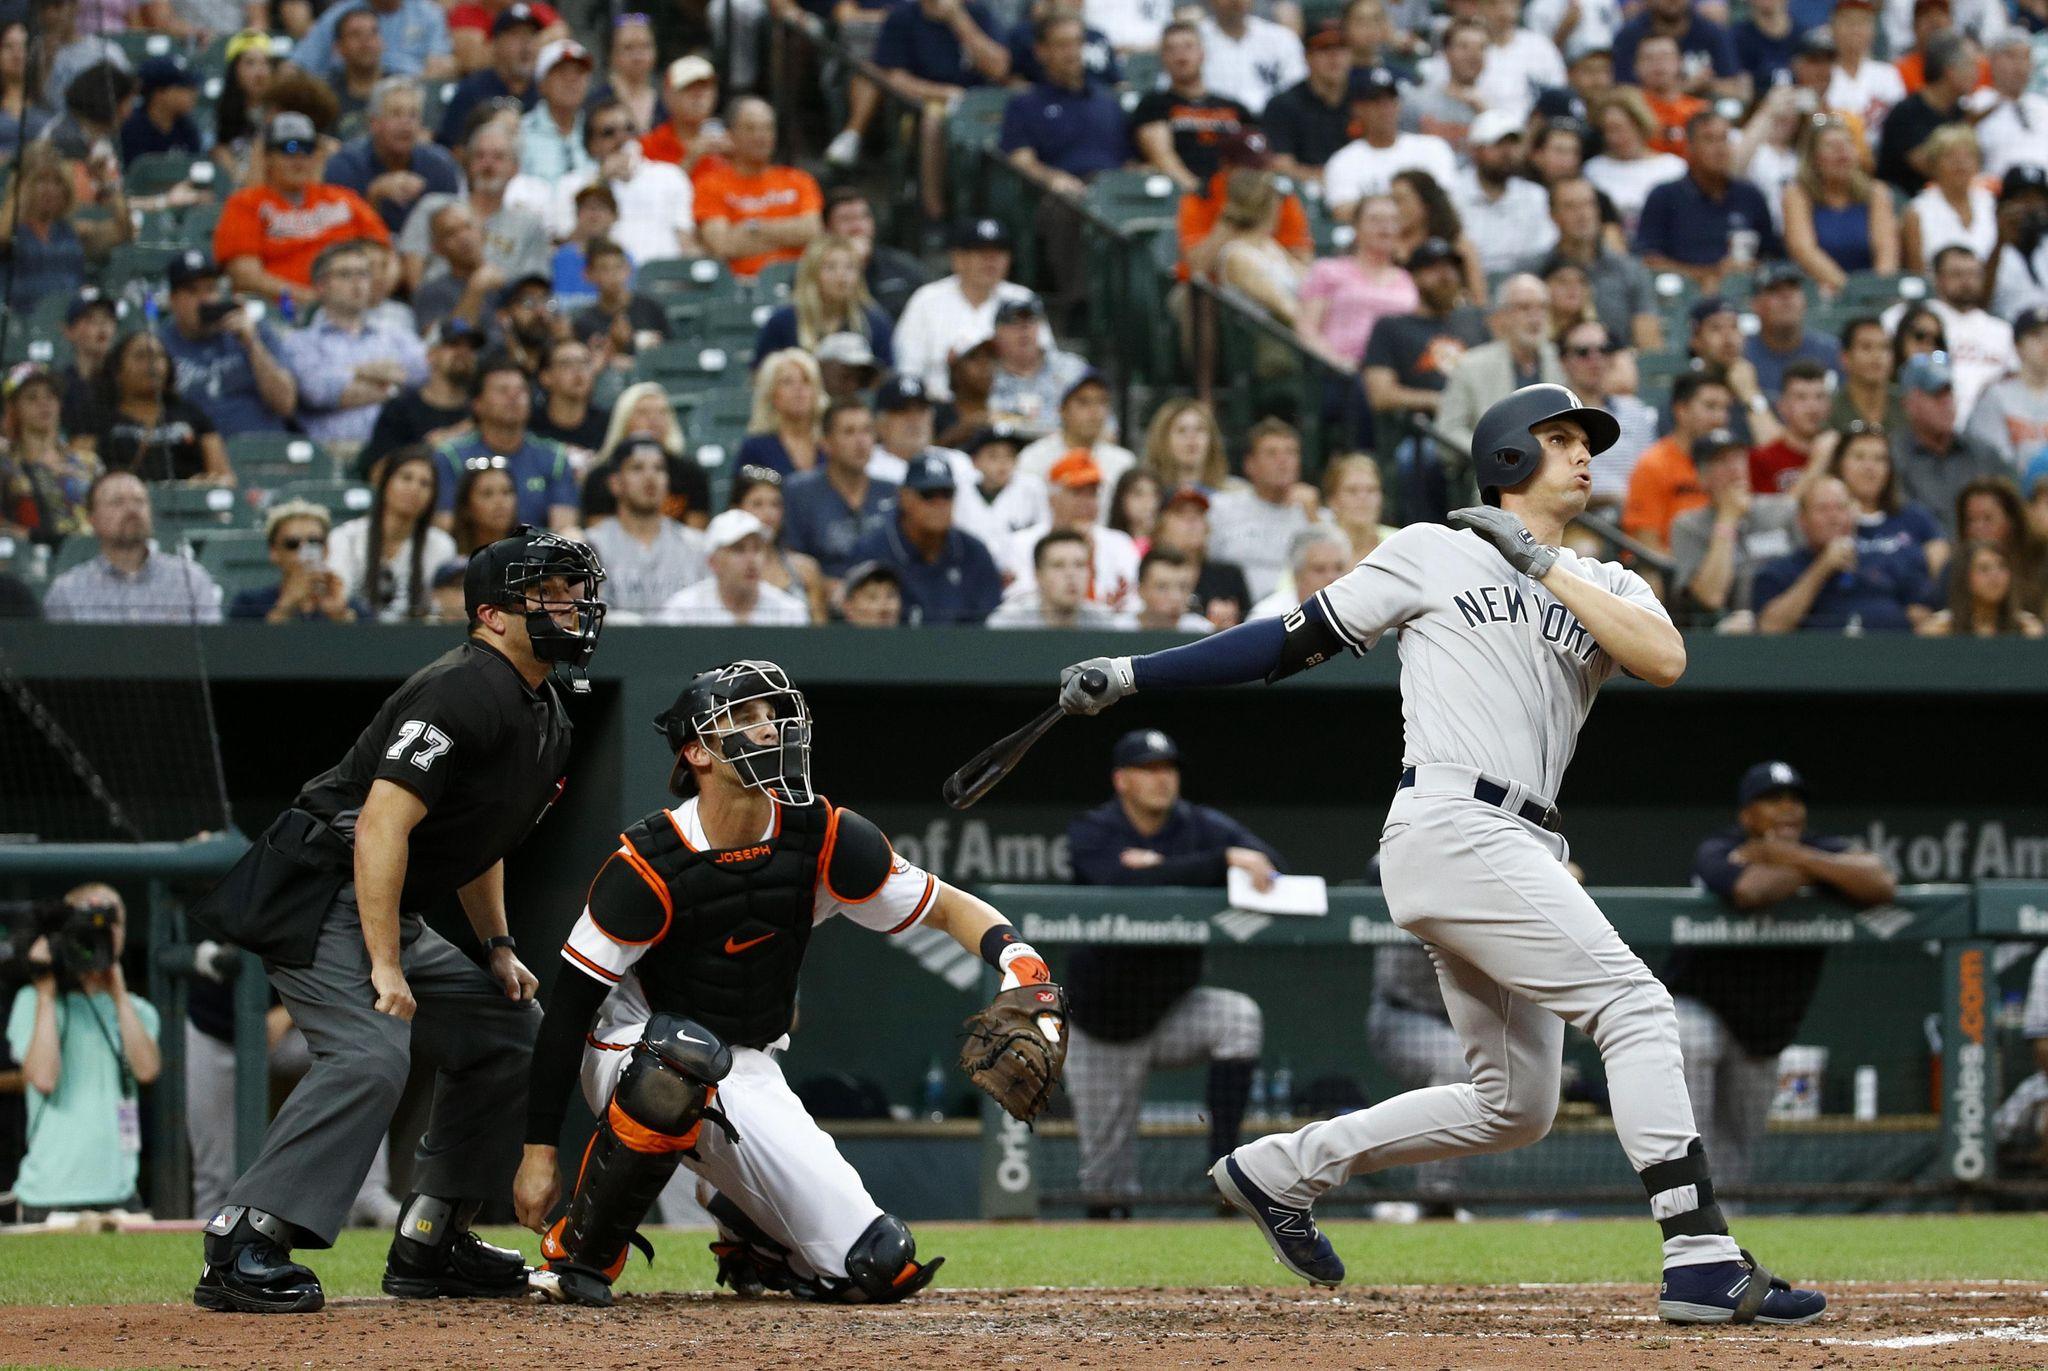 Yankees_orioles_baseball_96764_s2048x1371